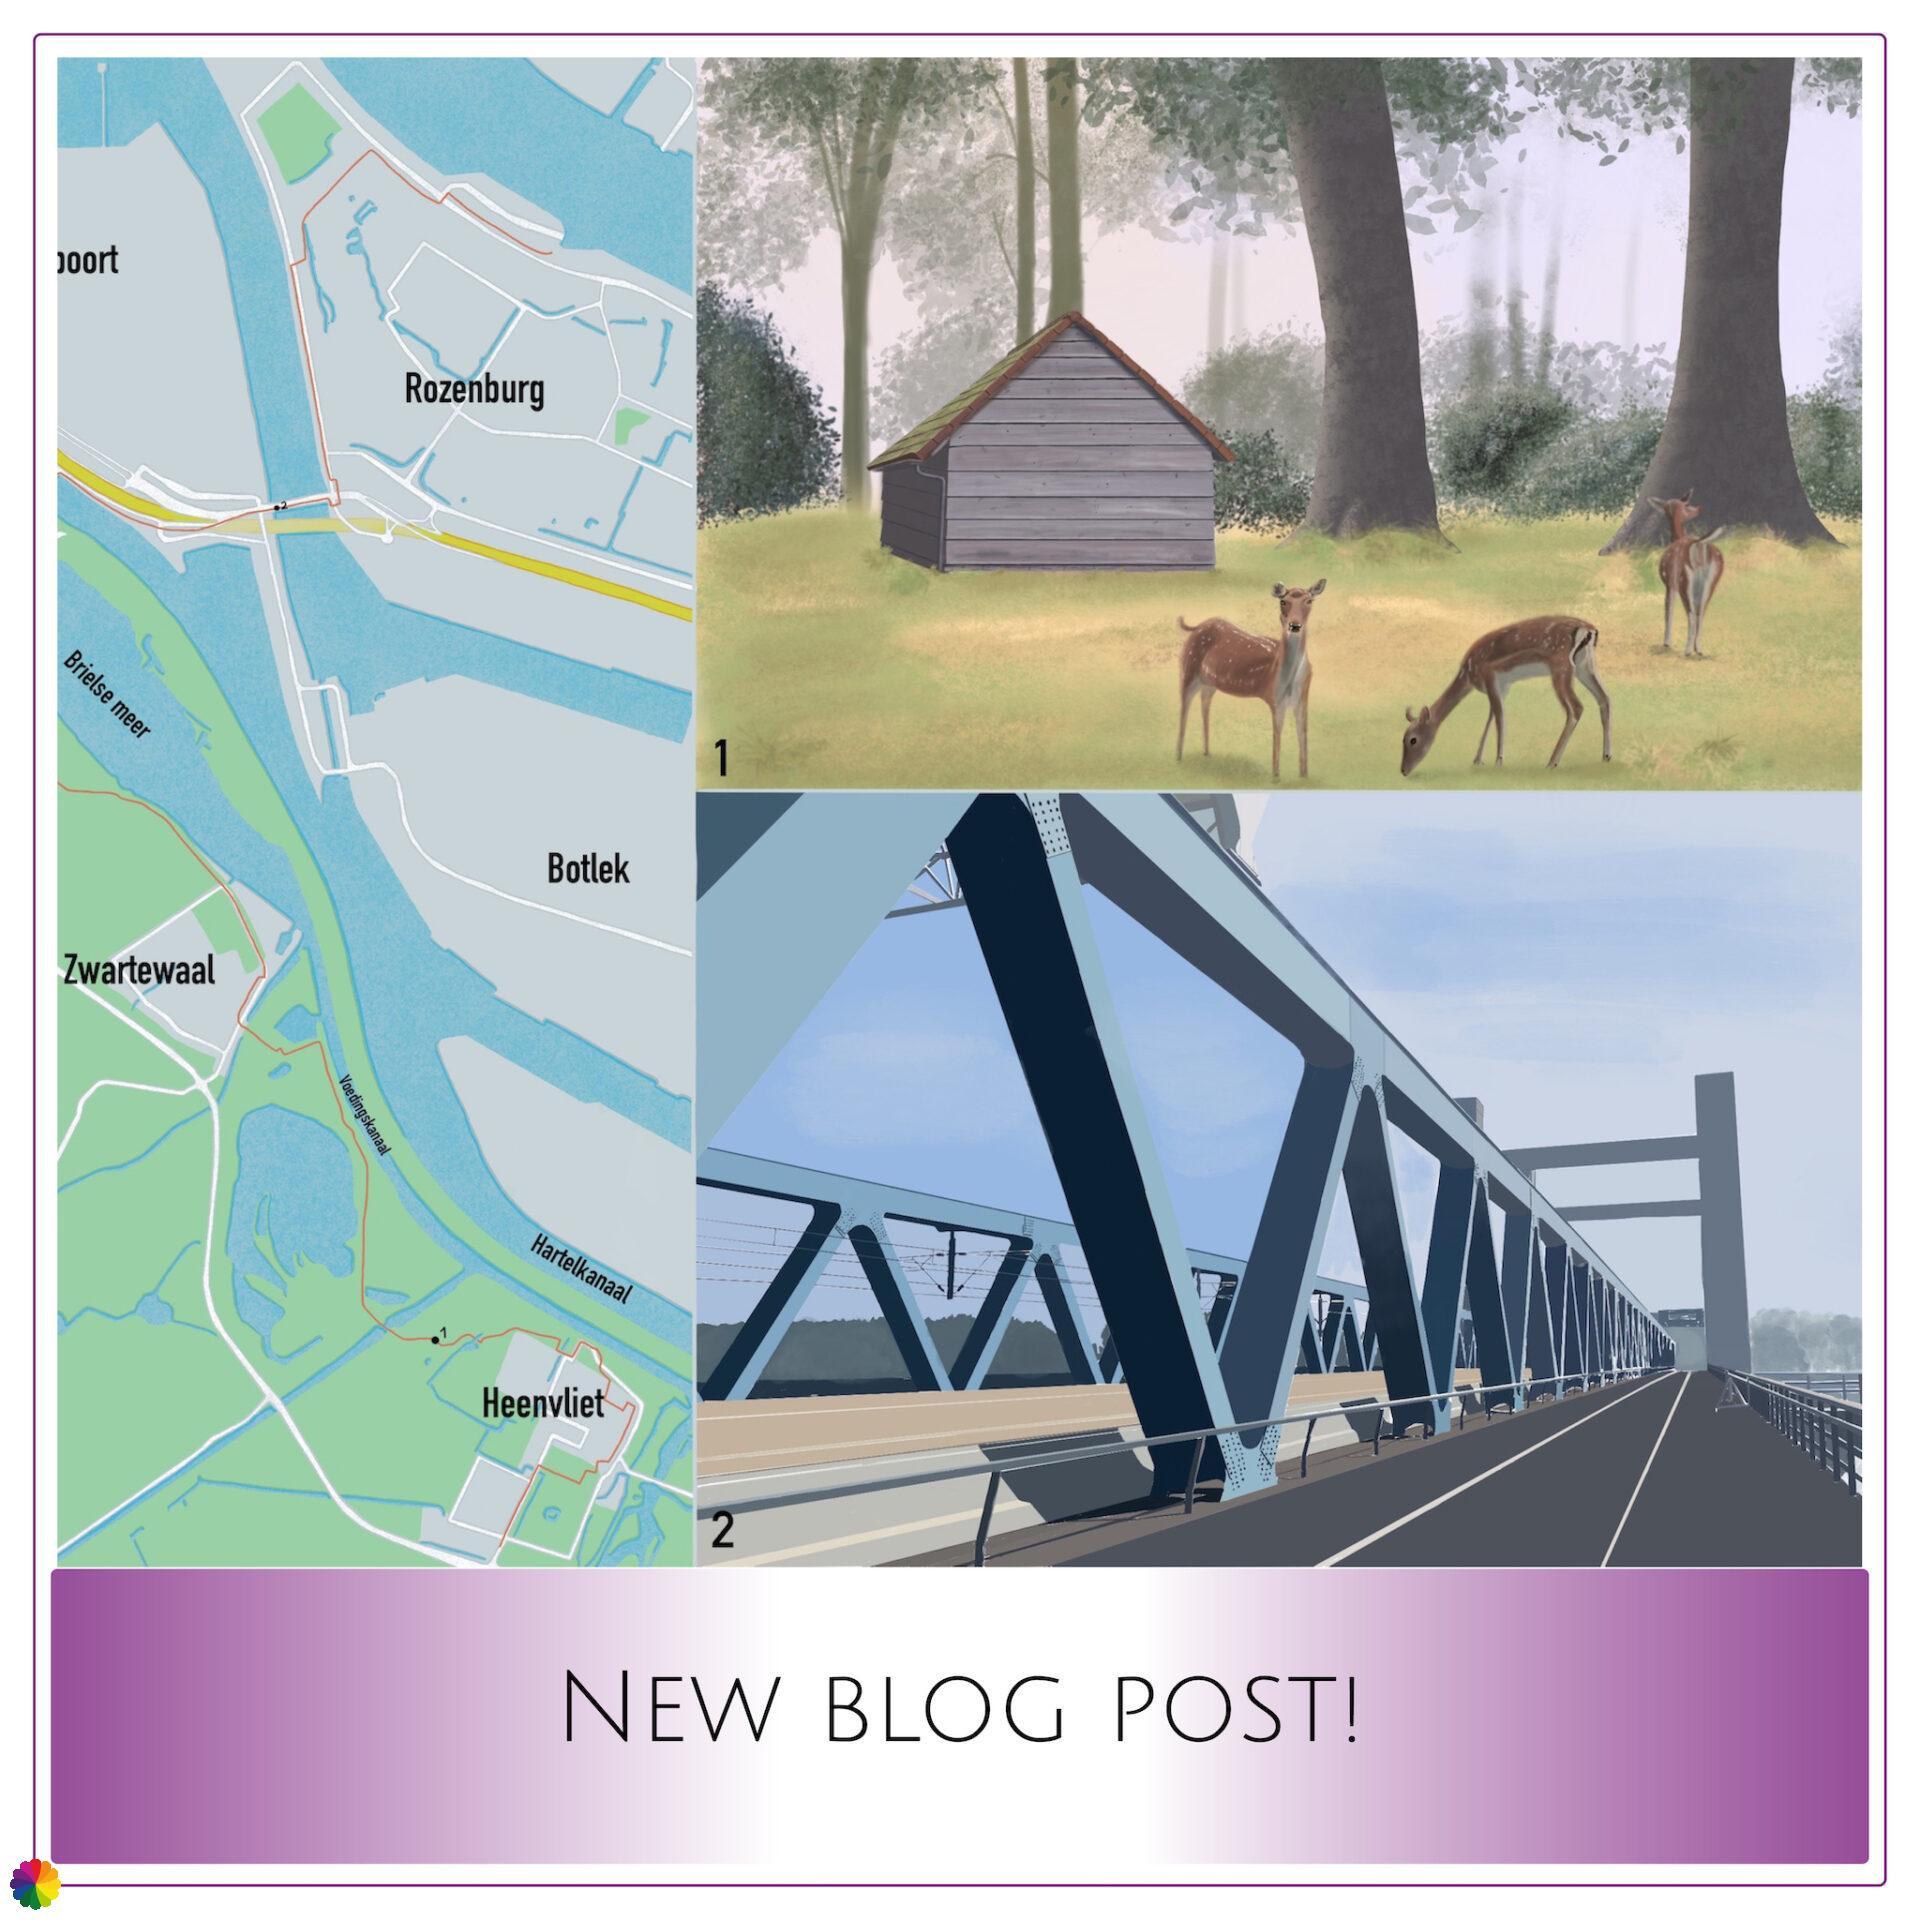 Blog update Heenvliet - Rozenburg